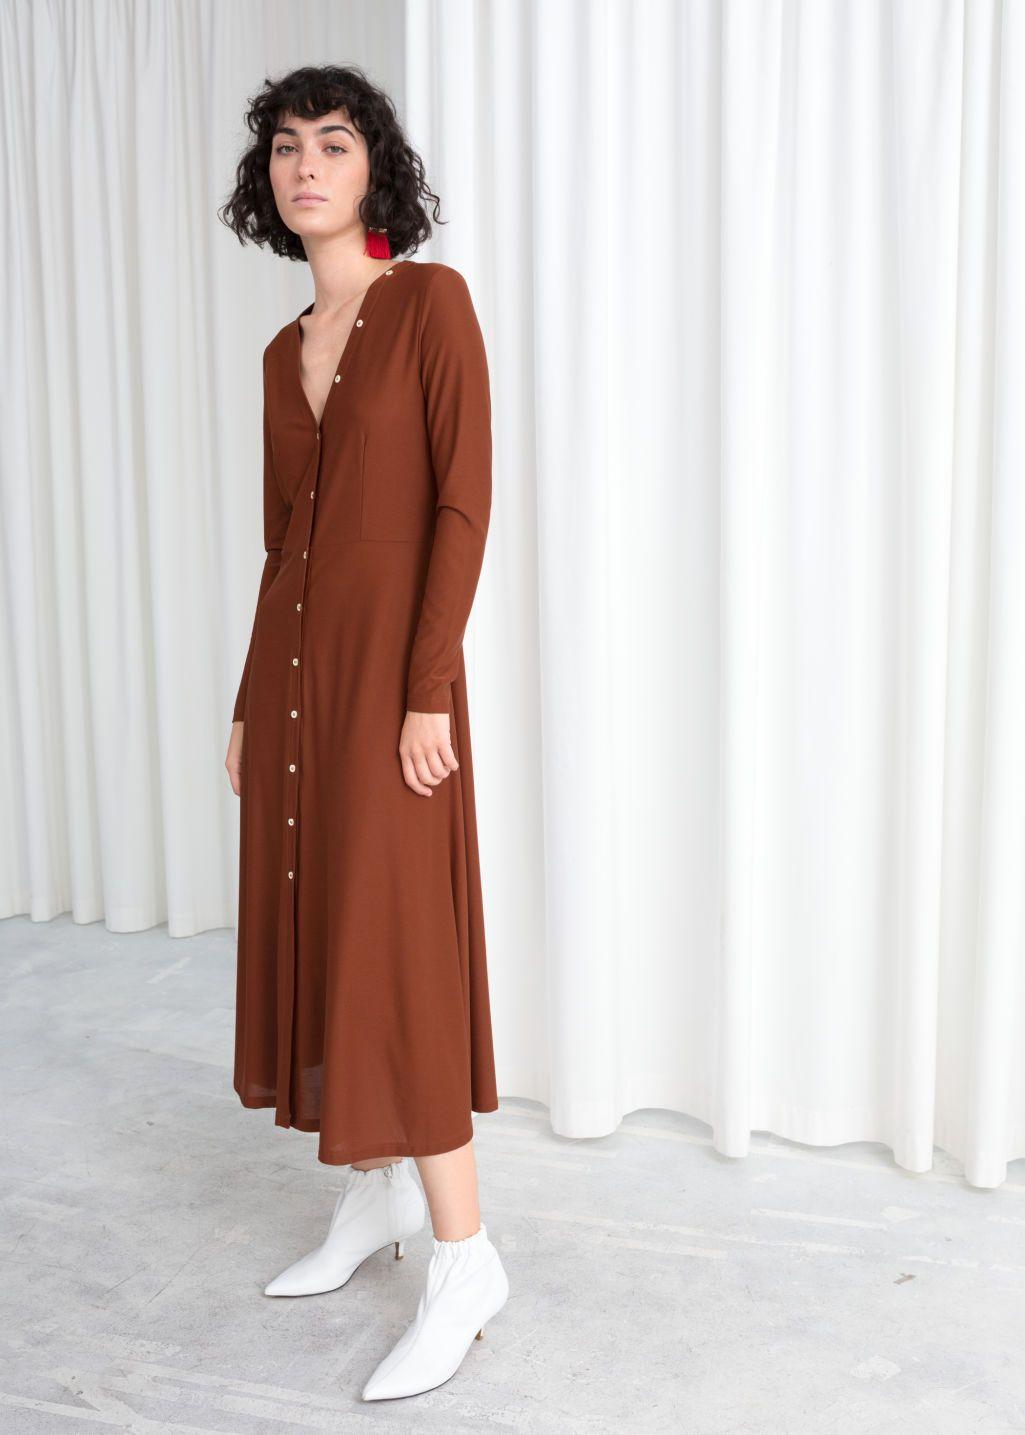 Button Up Midi Dress Fashion Midi Dress Dresses [ 1435 x 1025 Pixel ]